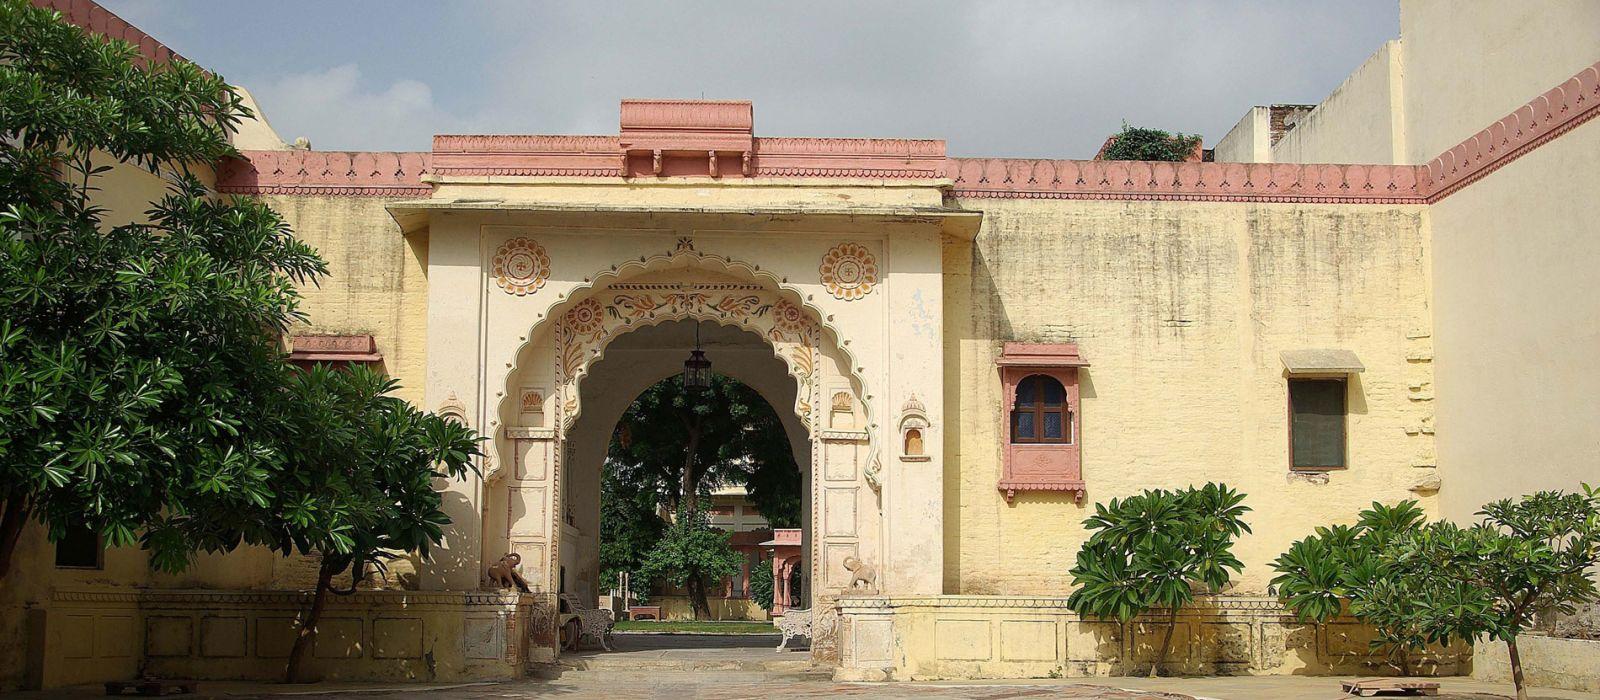 Destination Jojawar North India